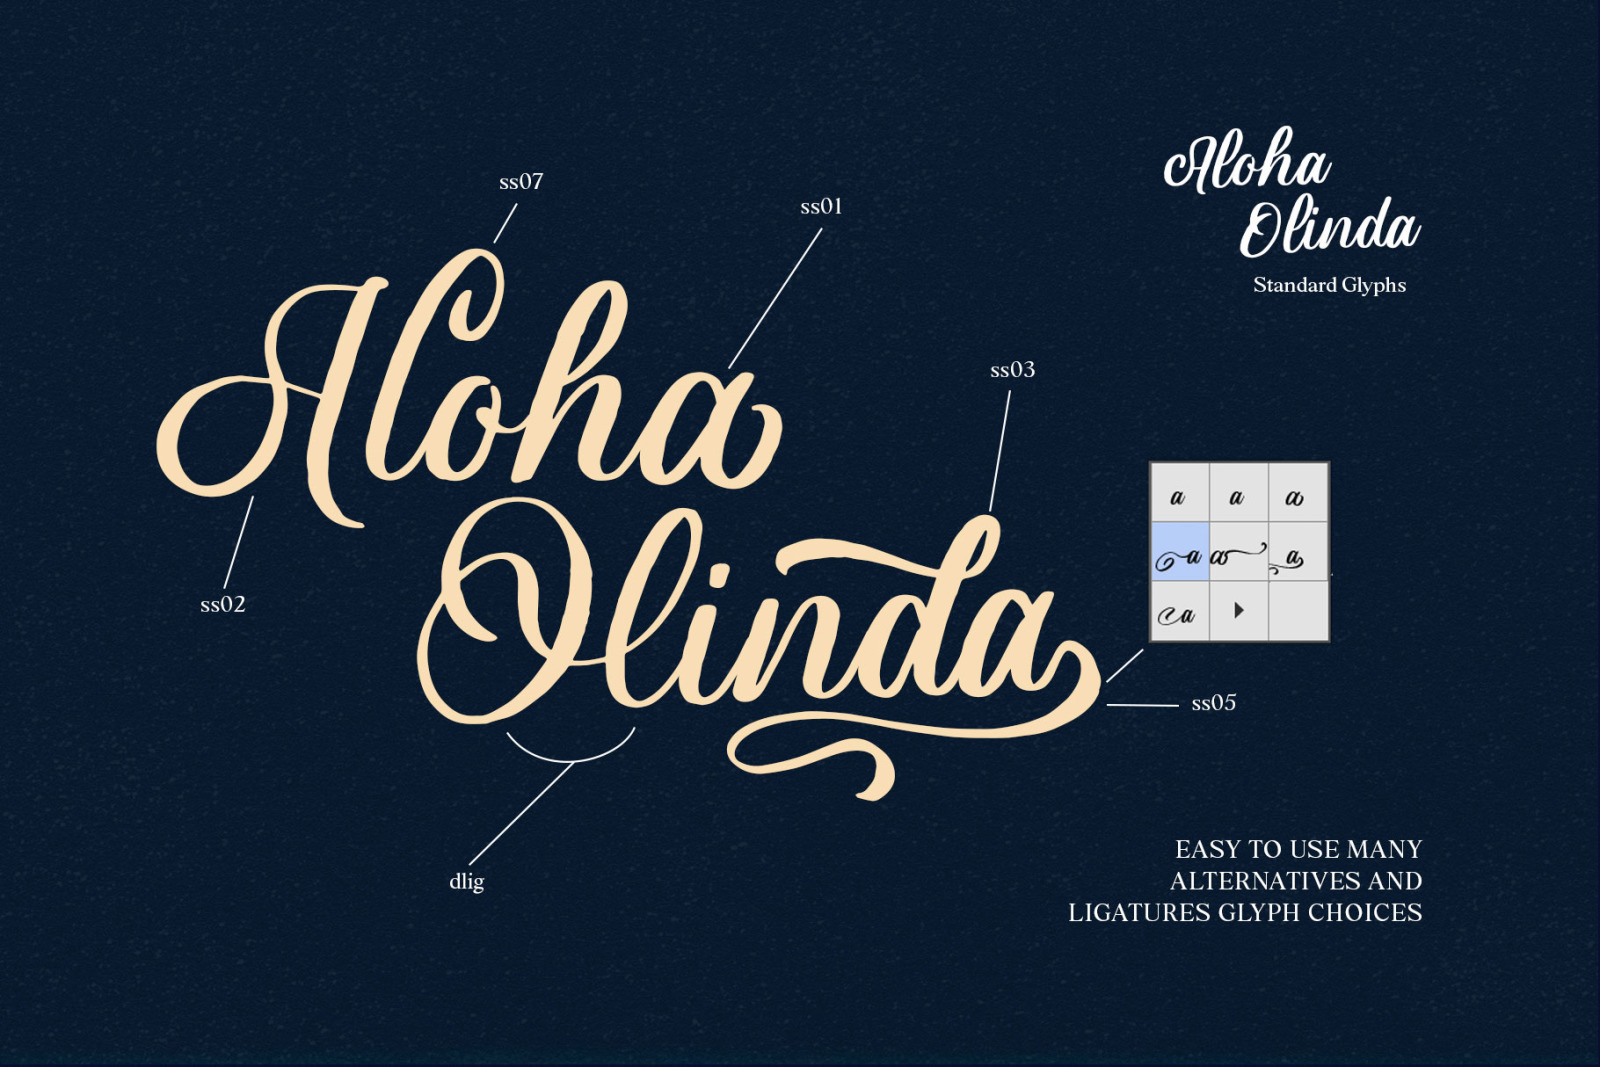 Aloha Olinda